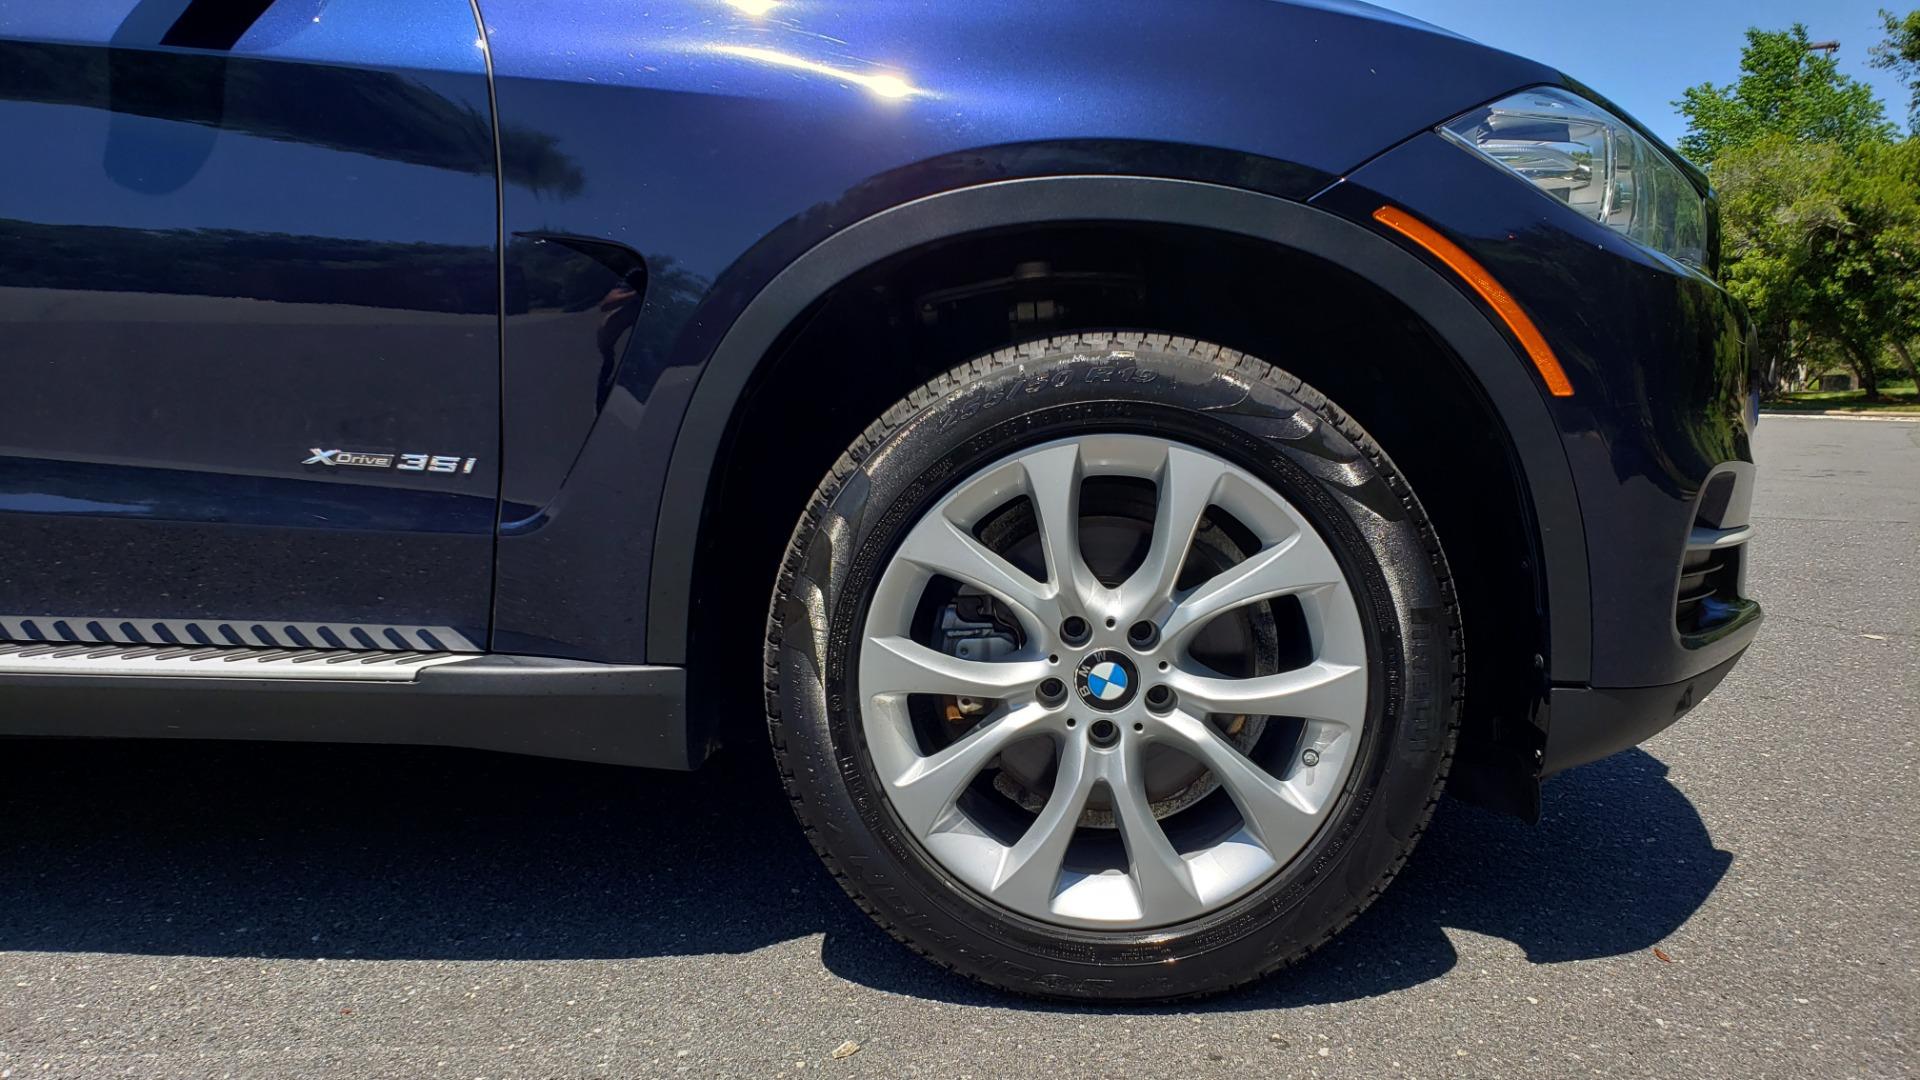 Used 2016 BMW X5 XDRIVE35I / PREM PKG / NAV / DRVR ASST PLUS / REARVIEW for sale $25,765 at Formula Imports in Charlotte NC 28227 66